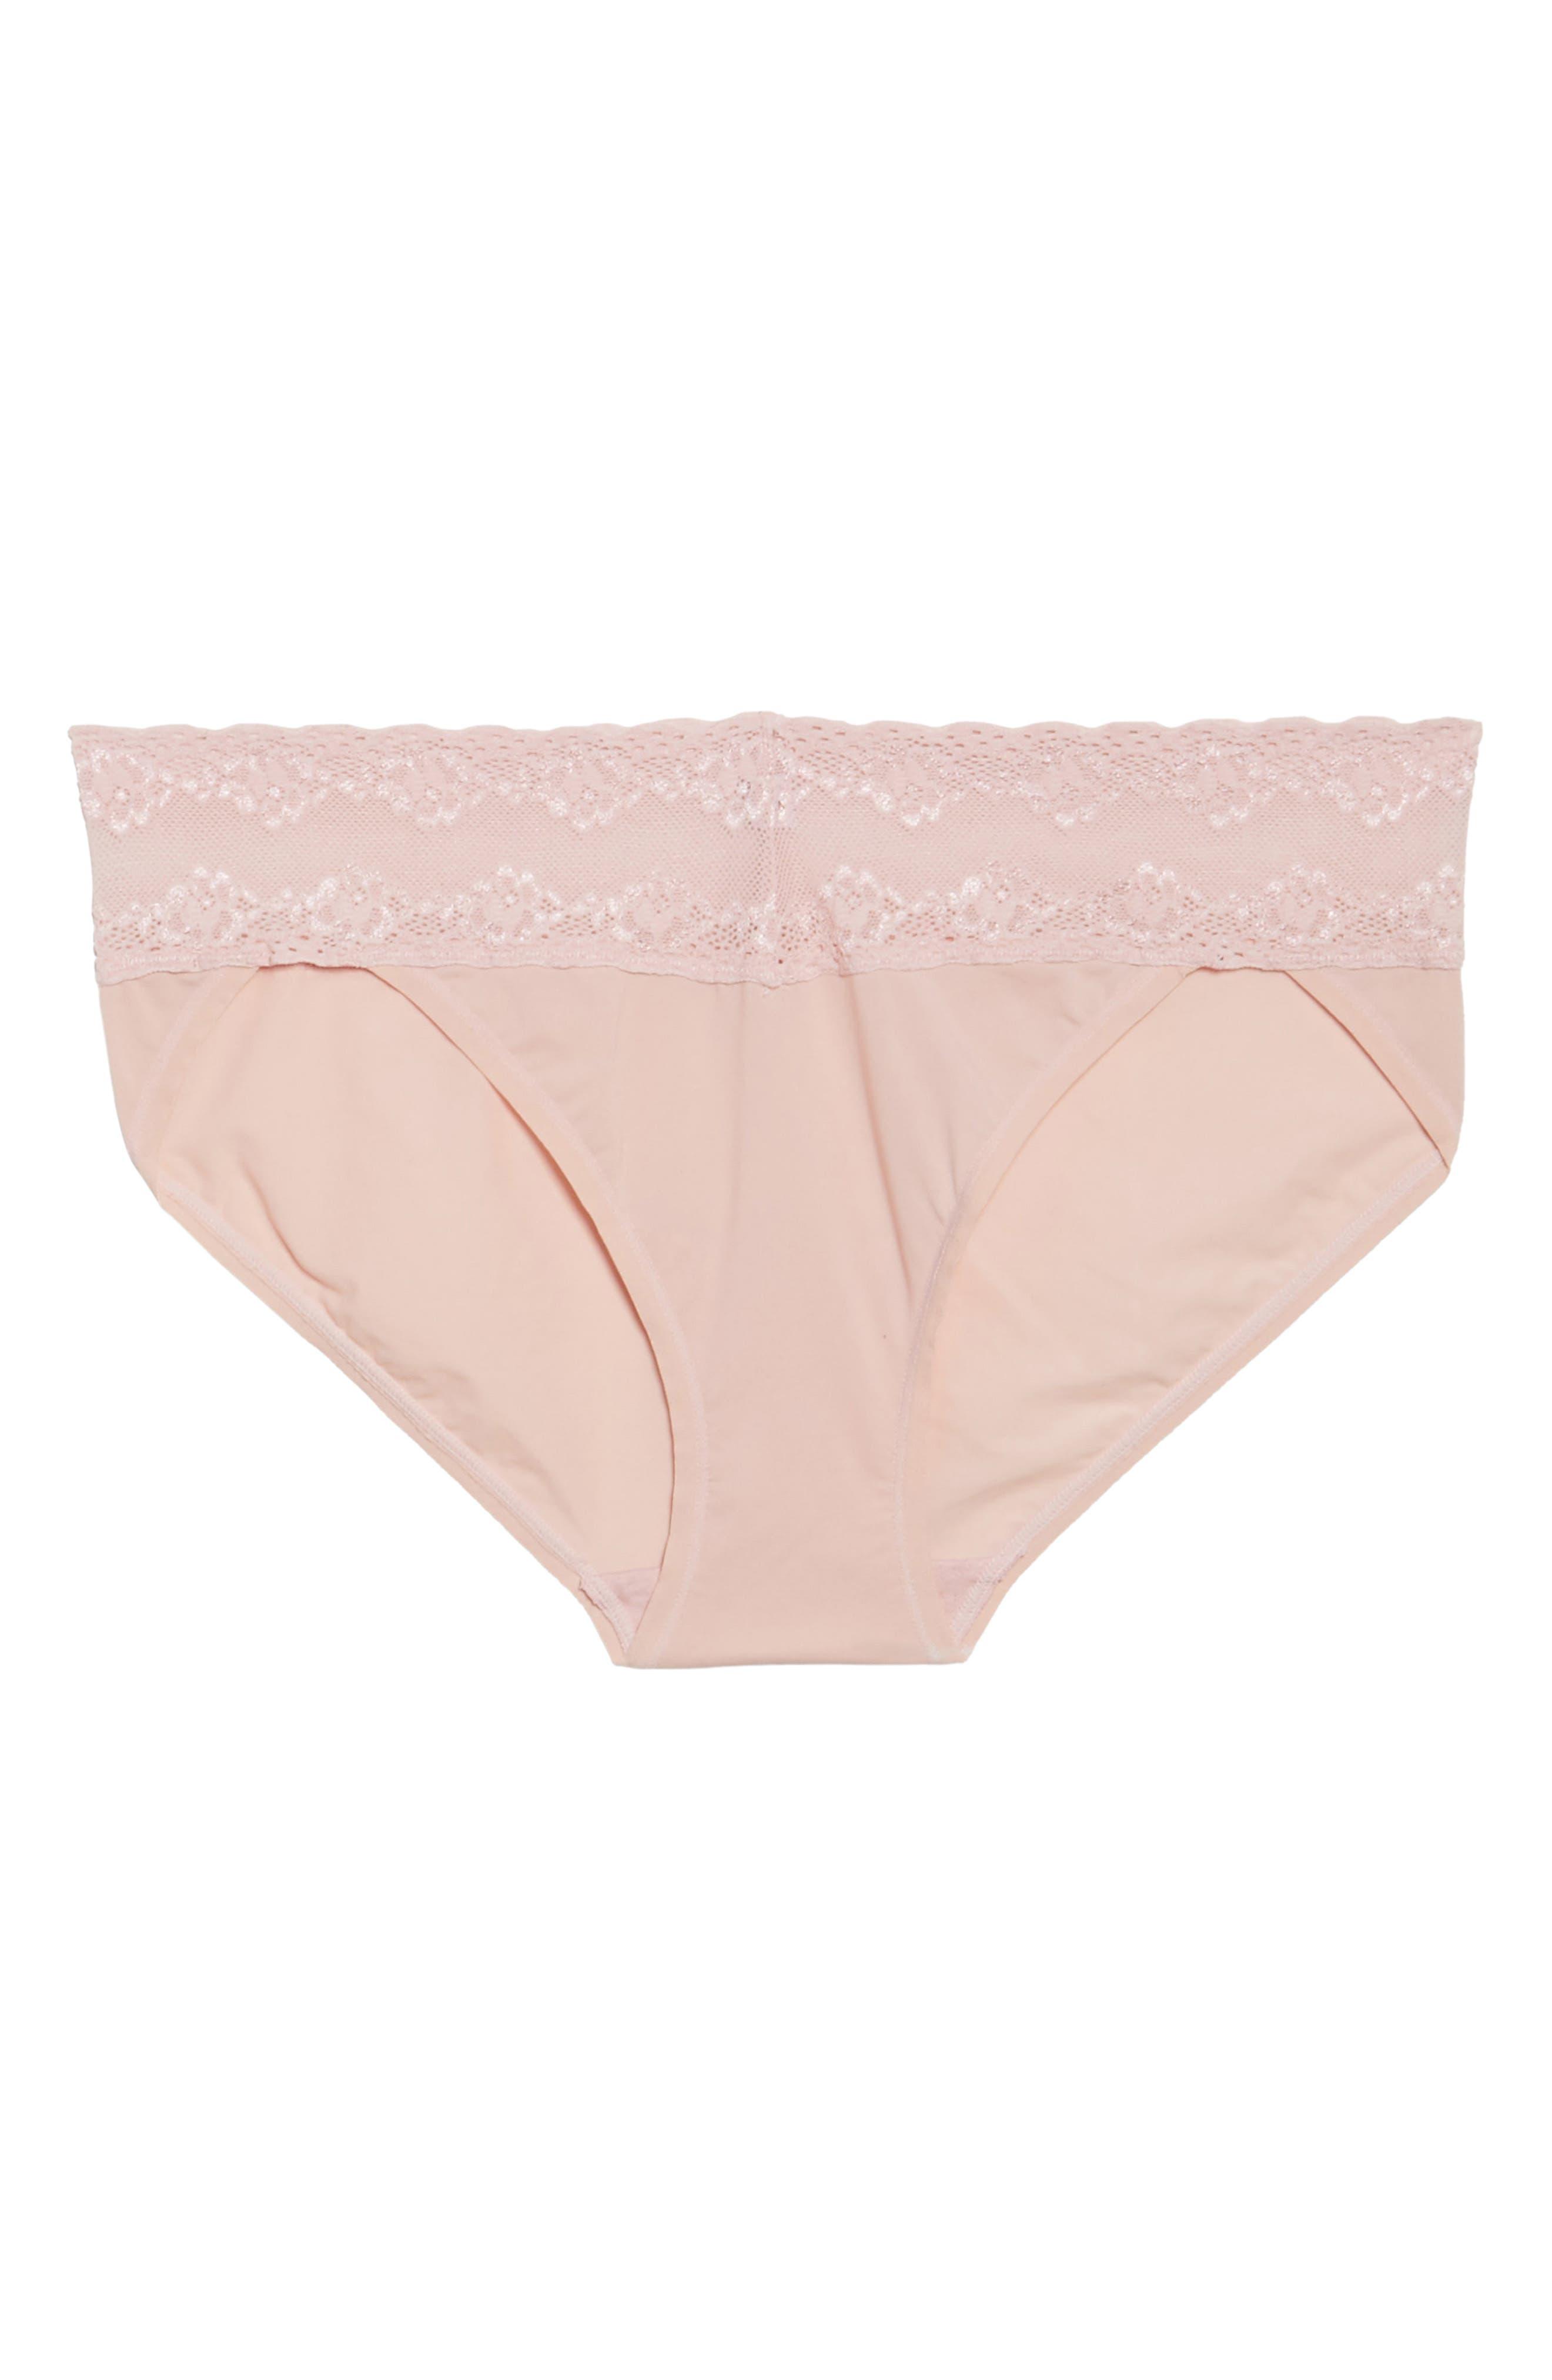 Alternate Image 4  - Natori Bliss Perfection Bikini (3 for $45)